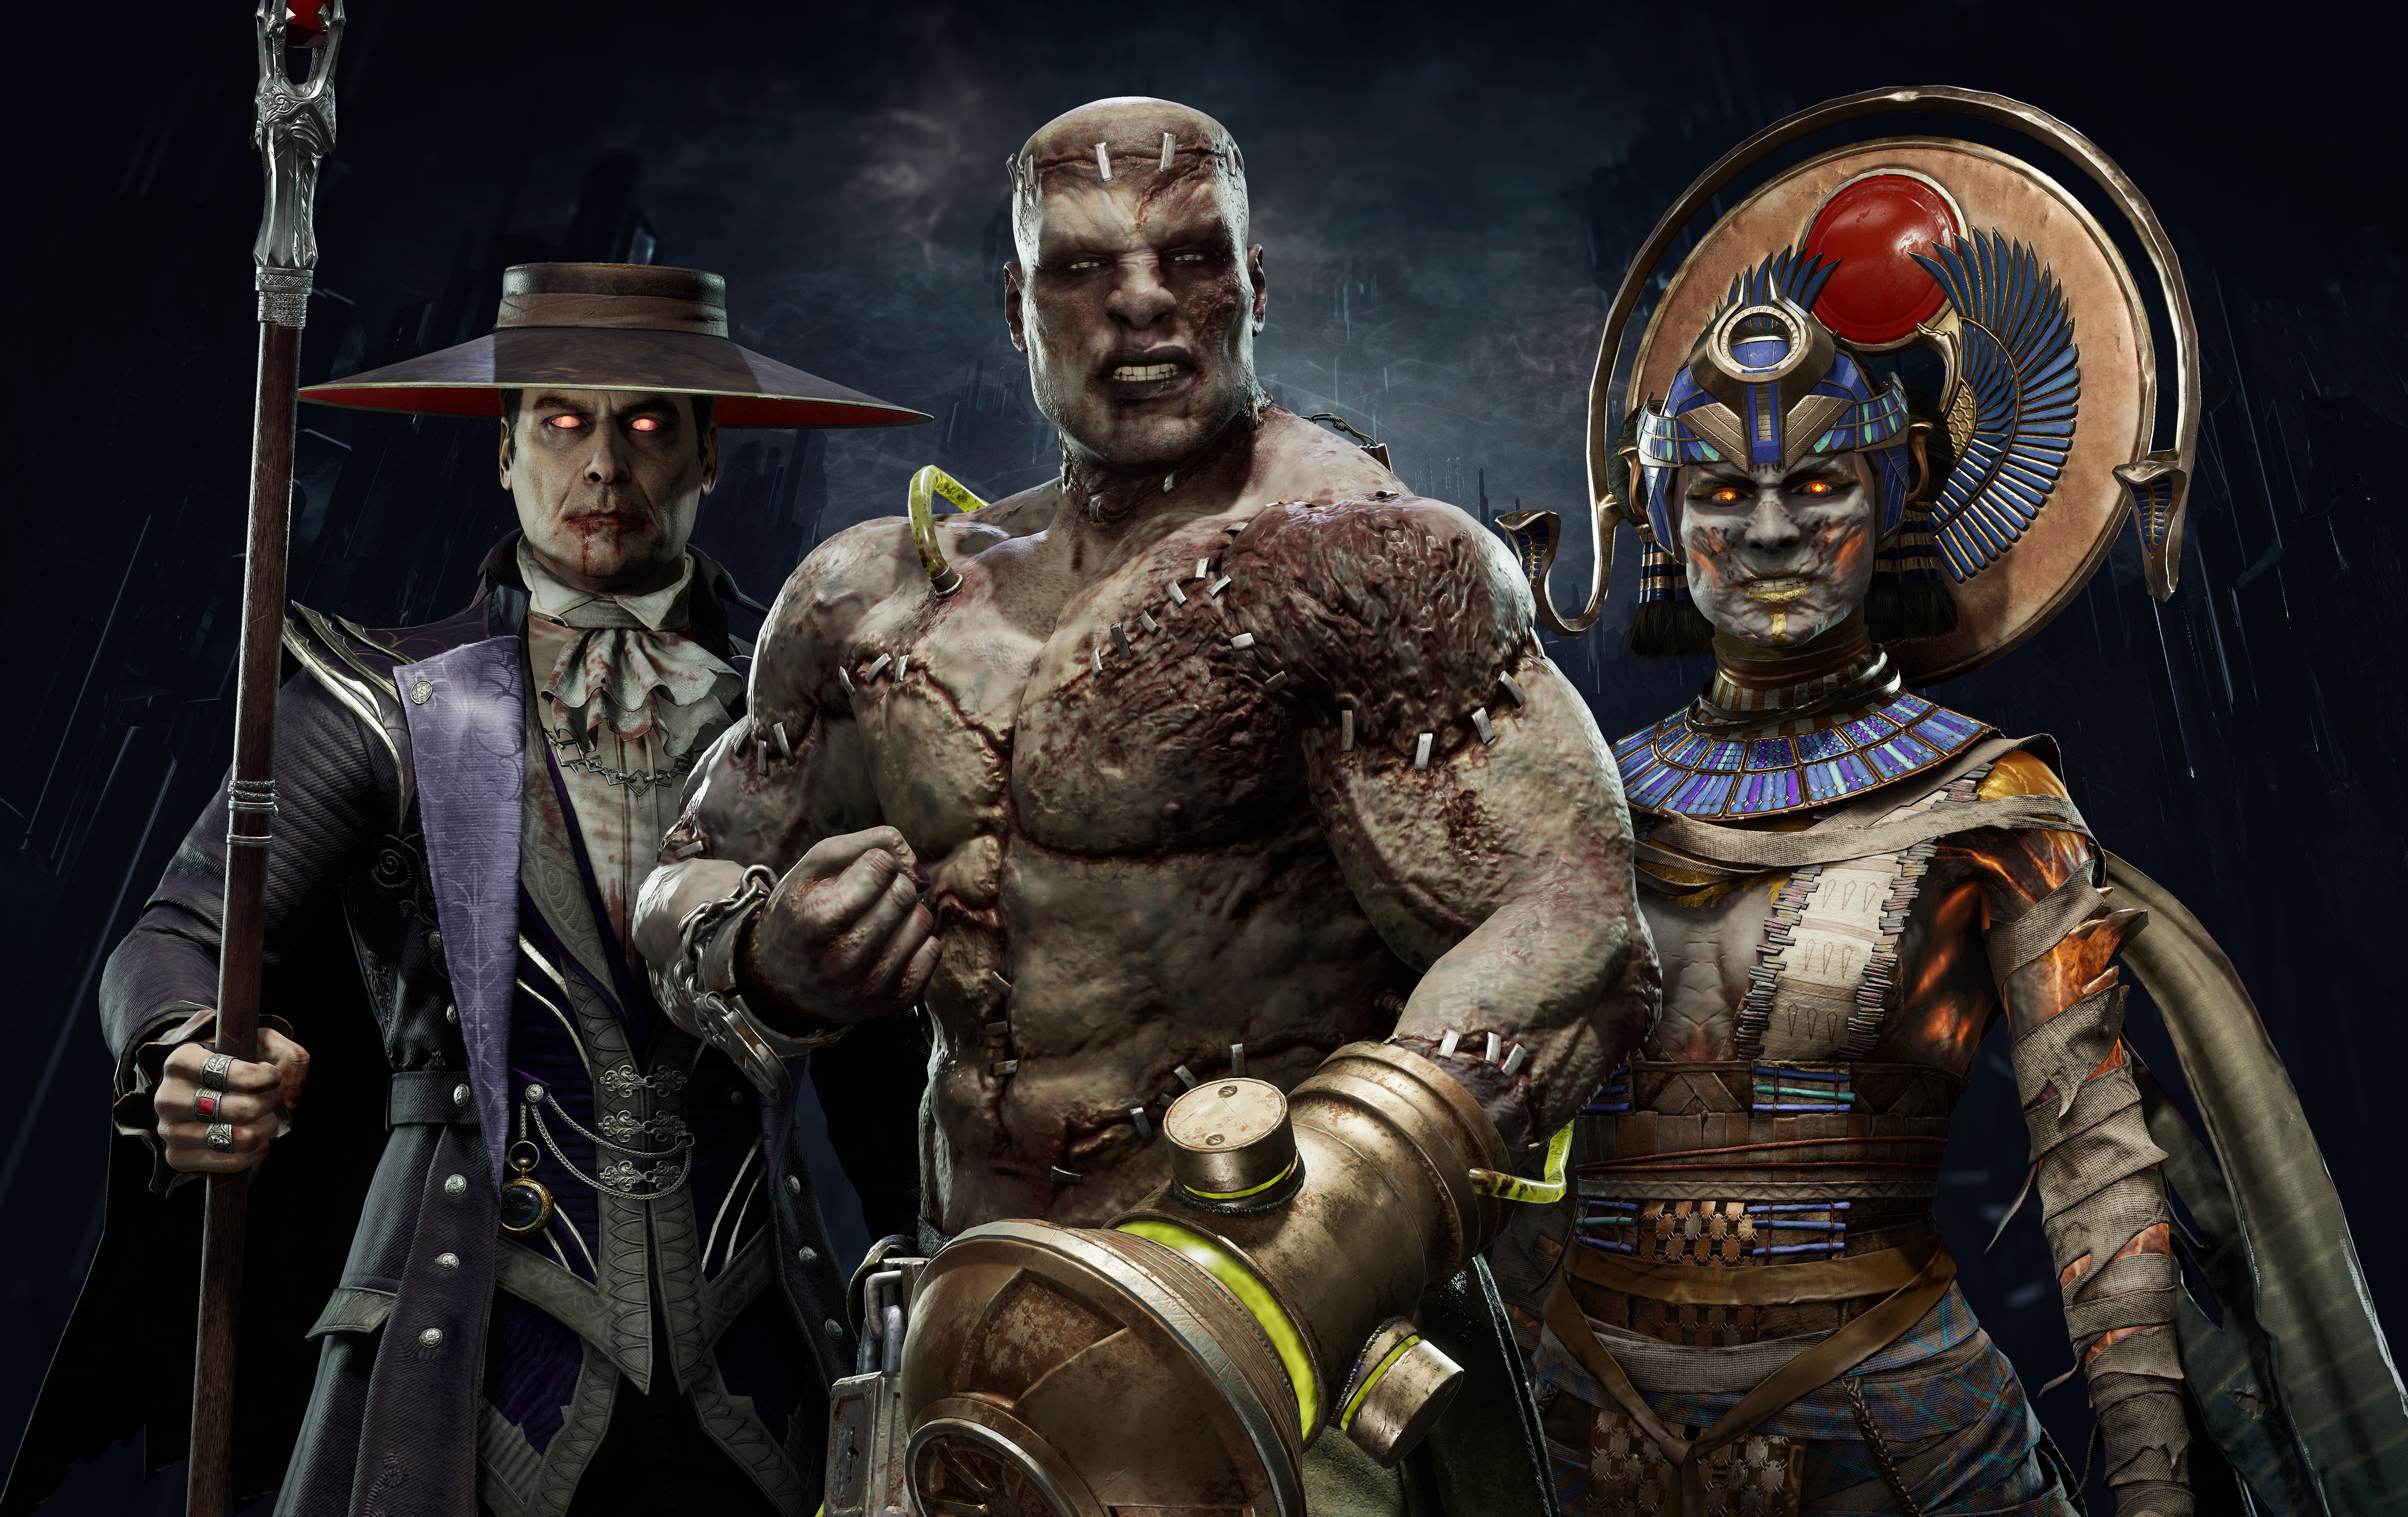 4K Mortal Kombat 11 Wallpaper, HD Games 4K Wallpapers ...